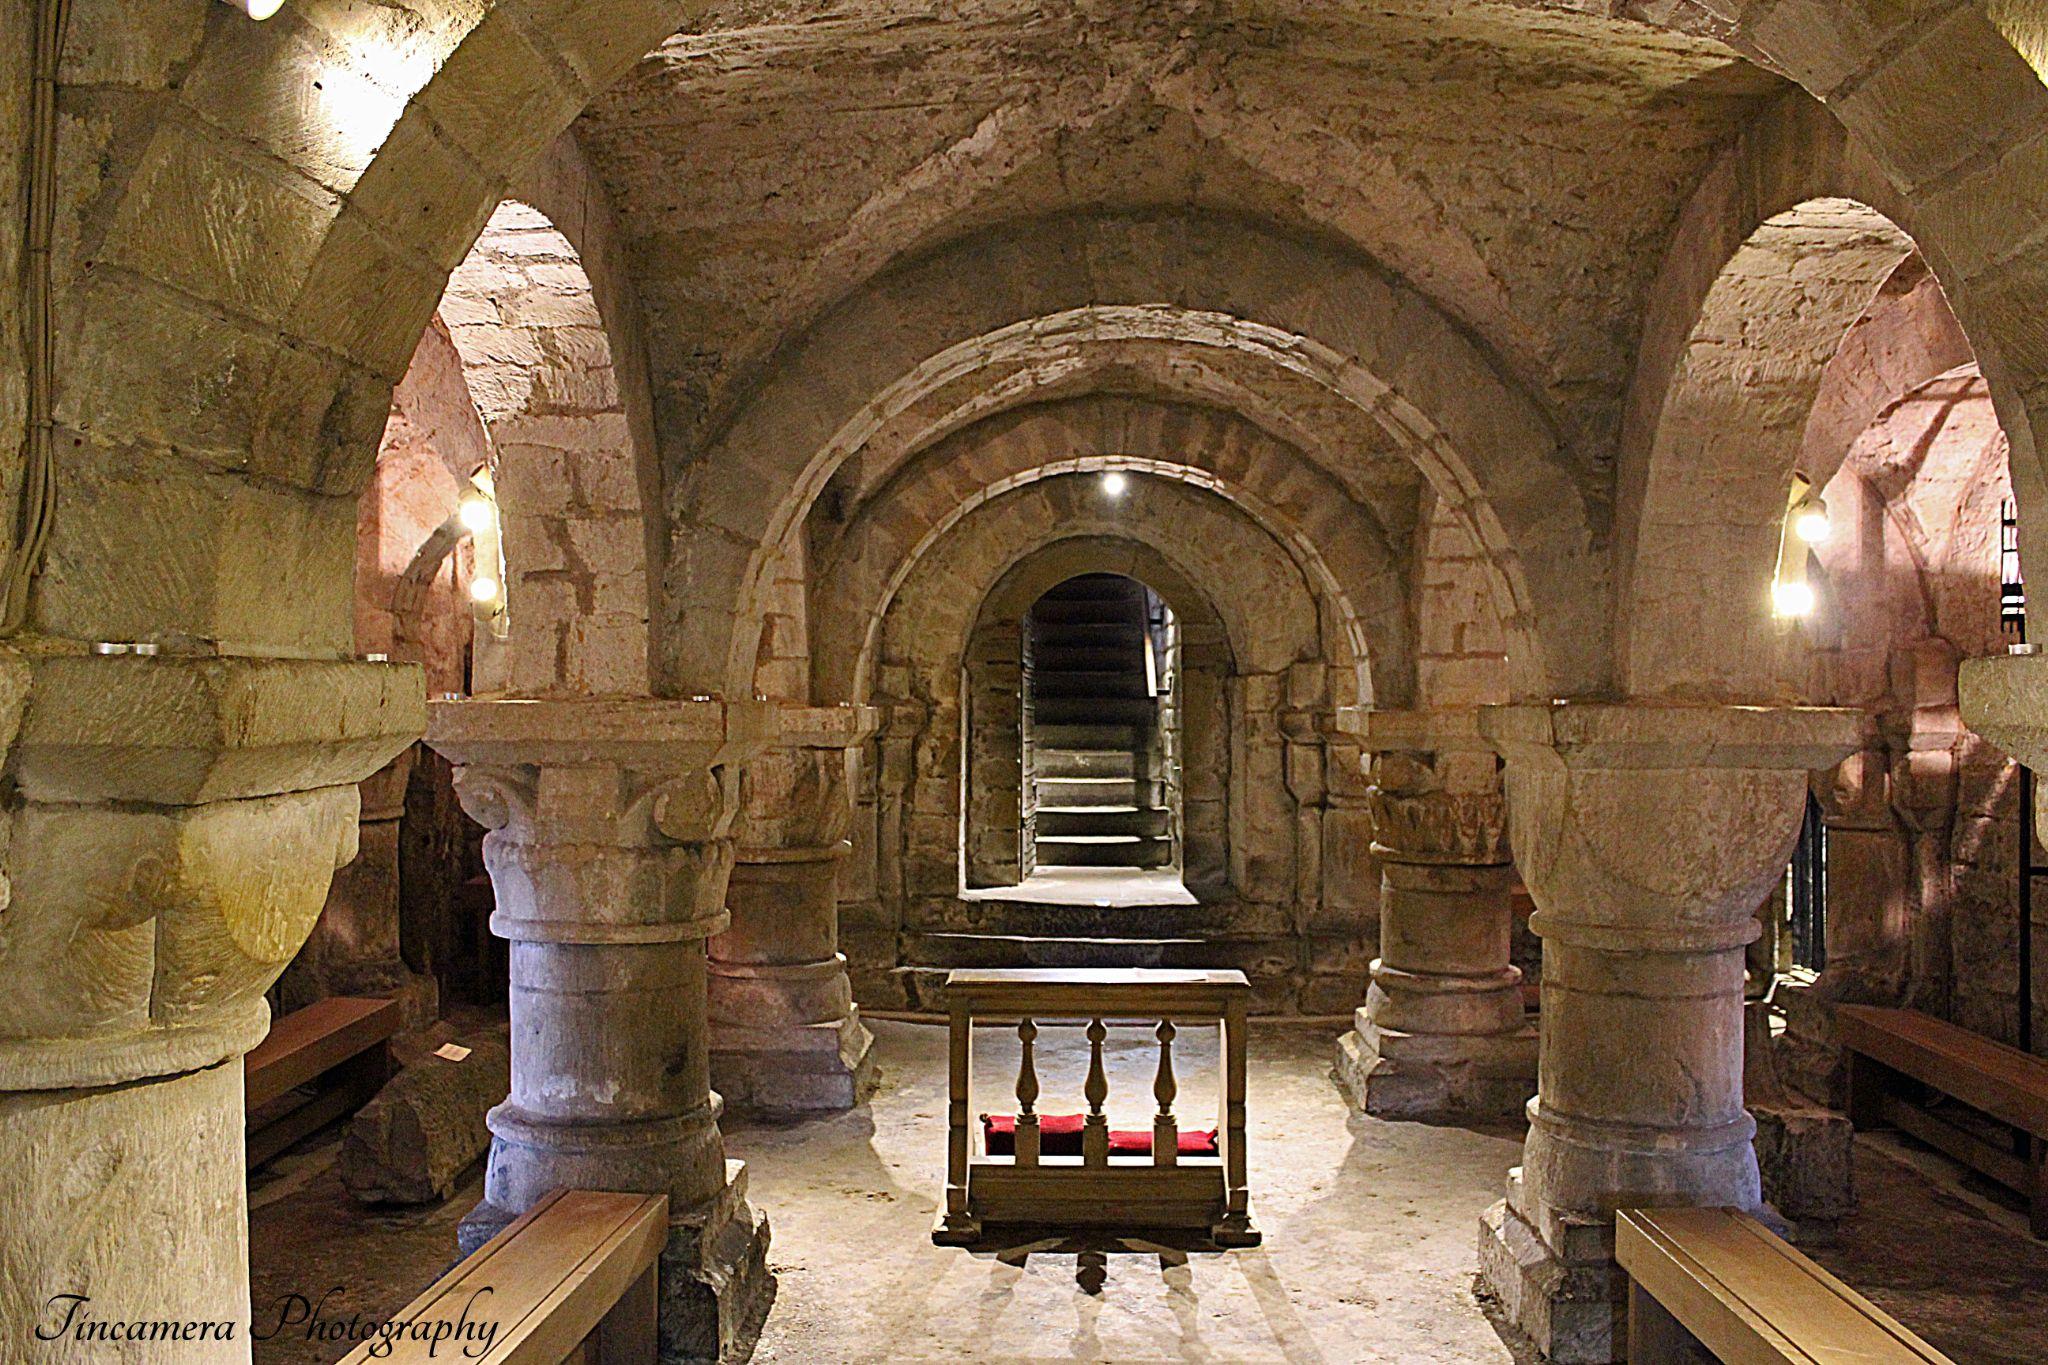 The Crypt. Lasingham Church. by john jenkinson